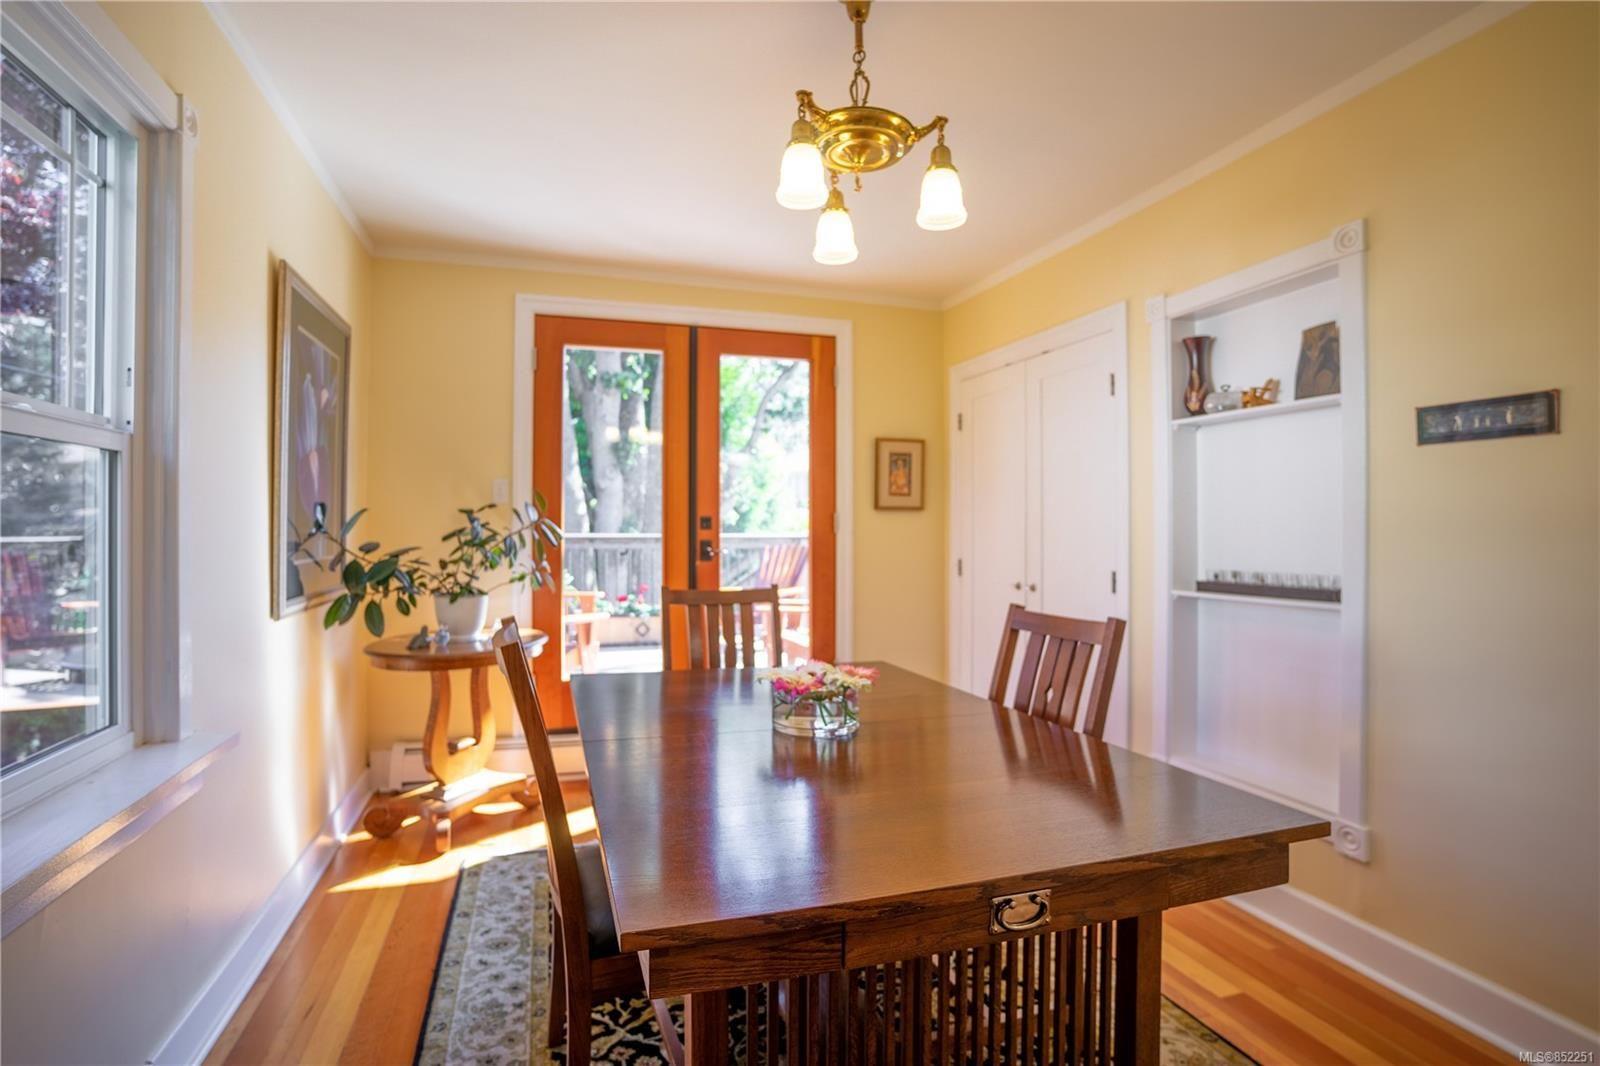 Photo 7: Photos: 2363 Pacific Ave in : OB Estevan House for sale (Oak Bay)  : MLS®# 852251